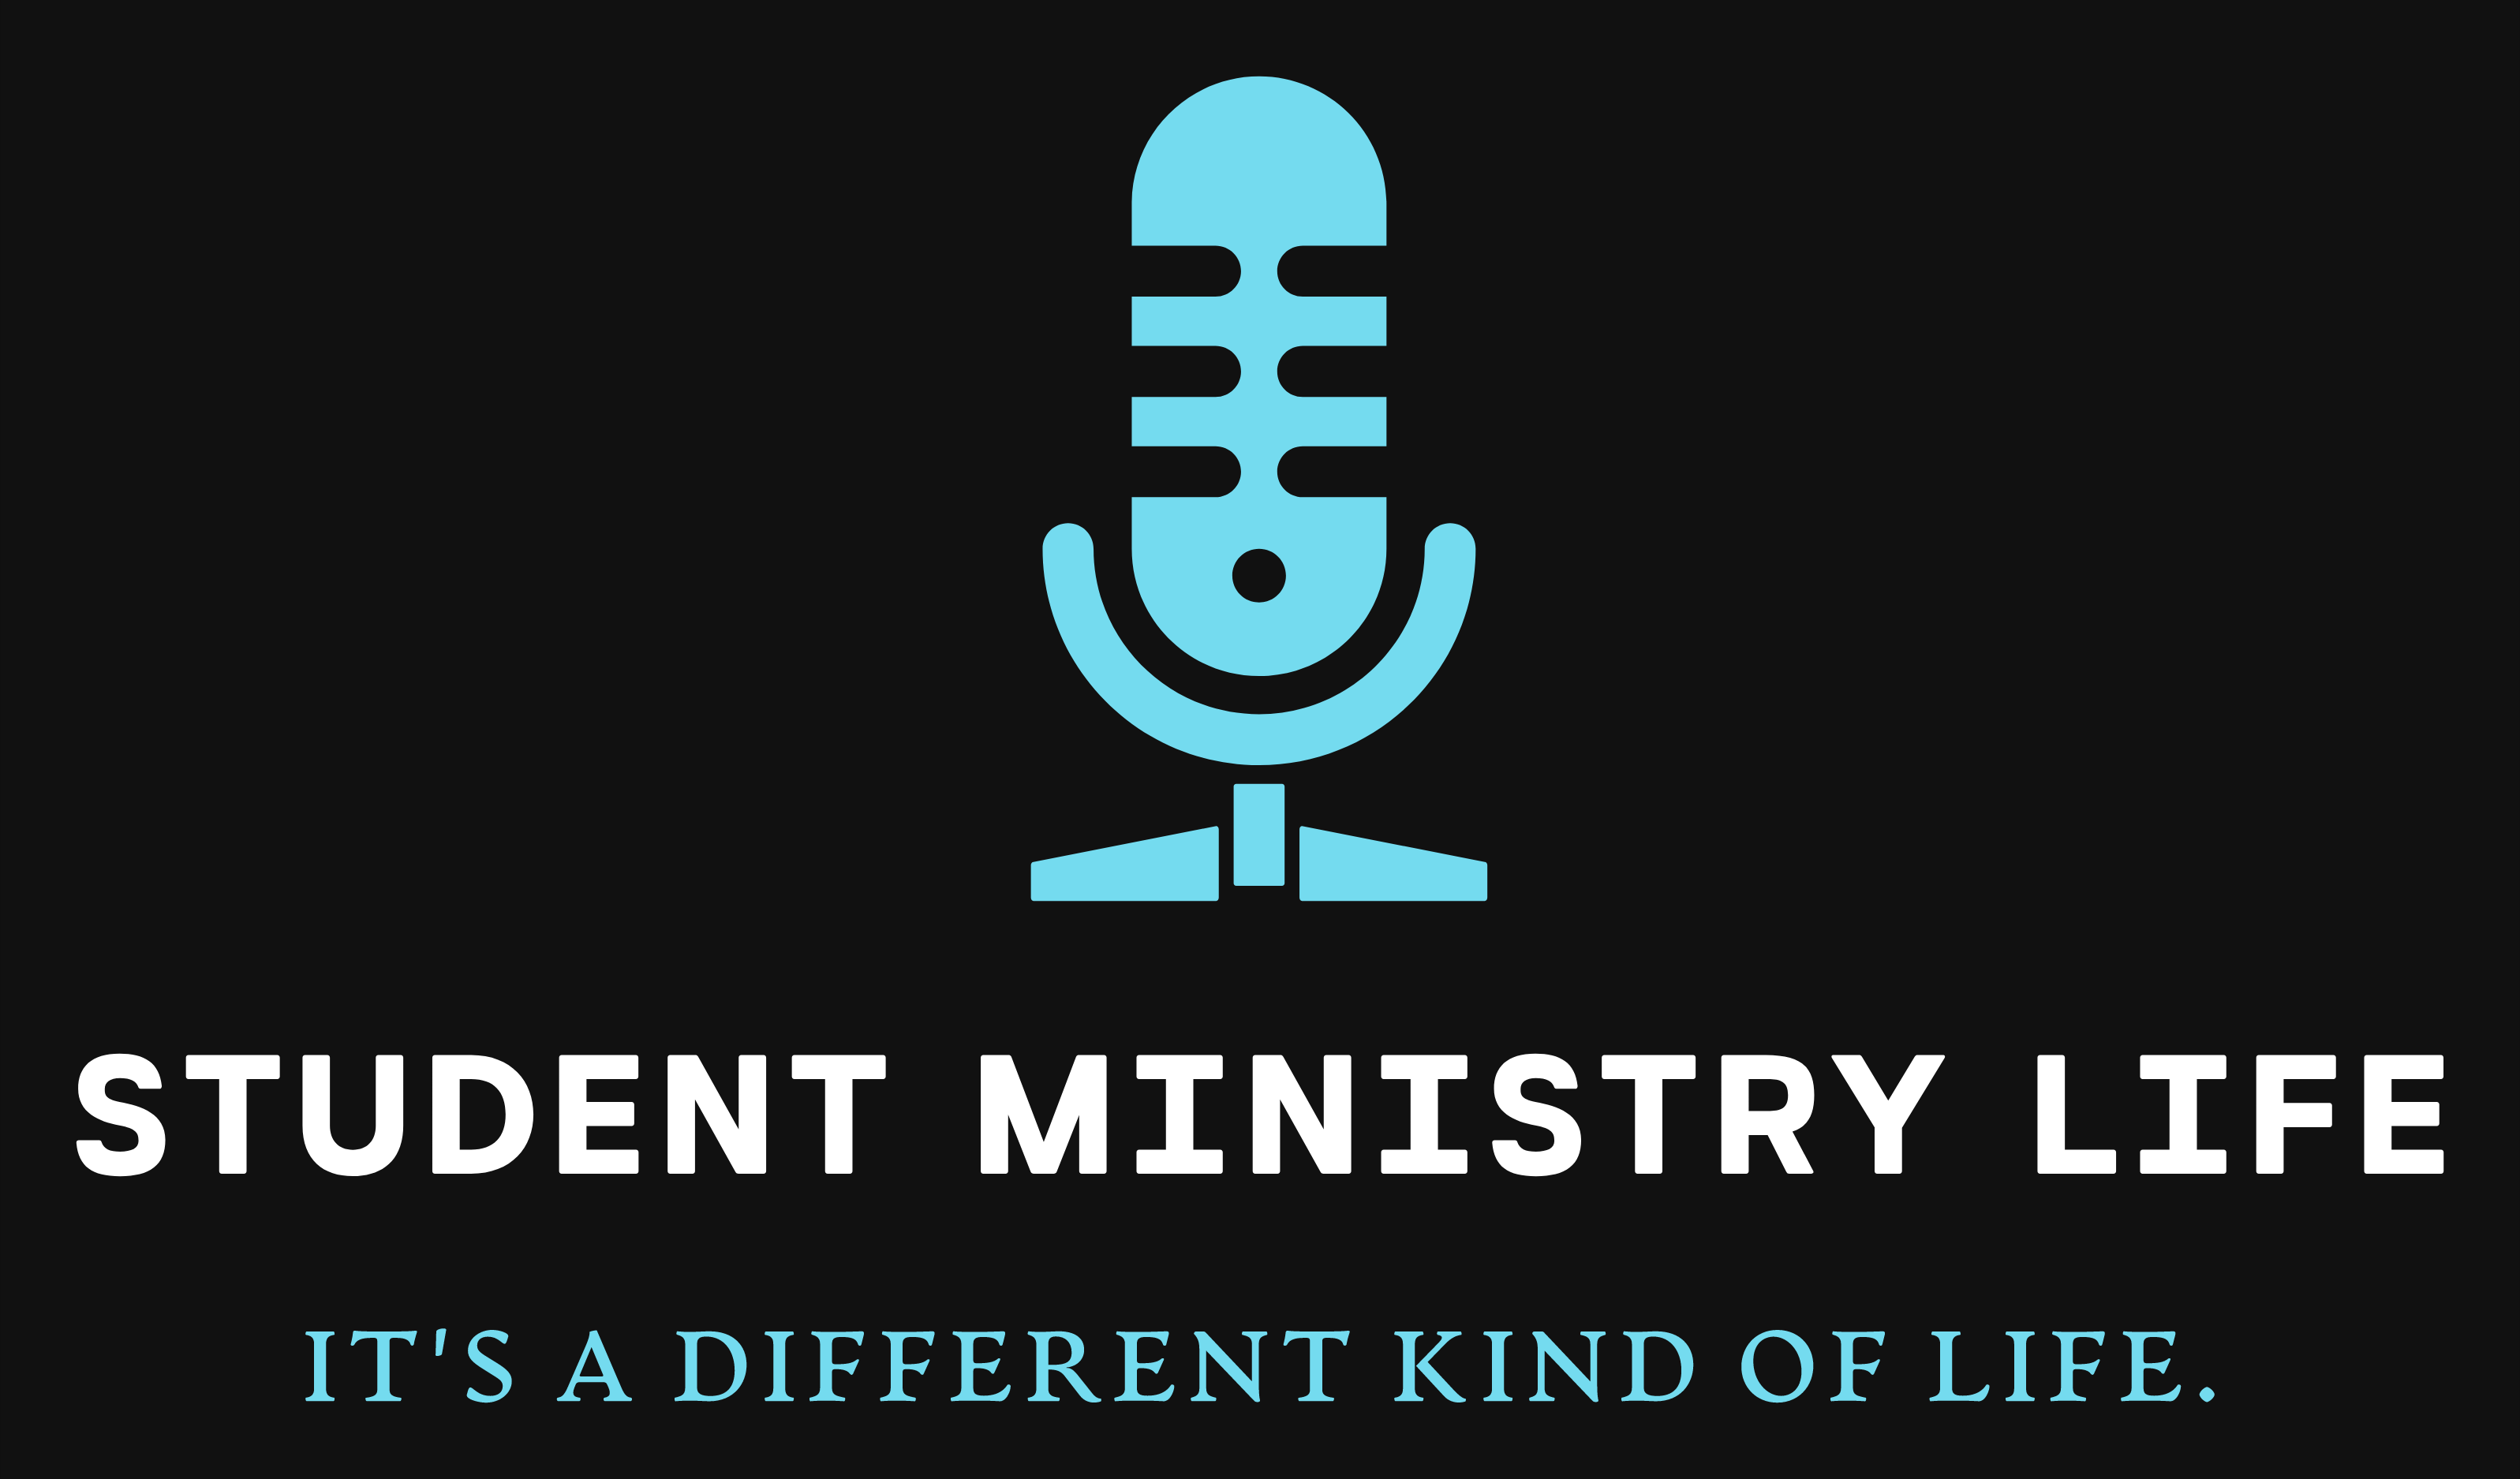 Student Ministry Life by Nick Ballard